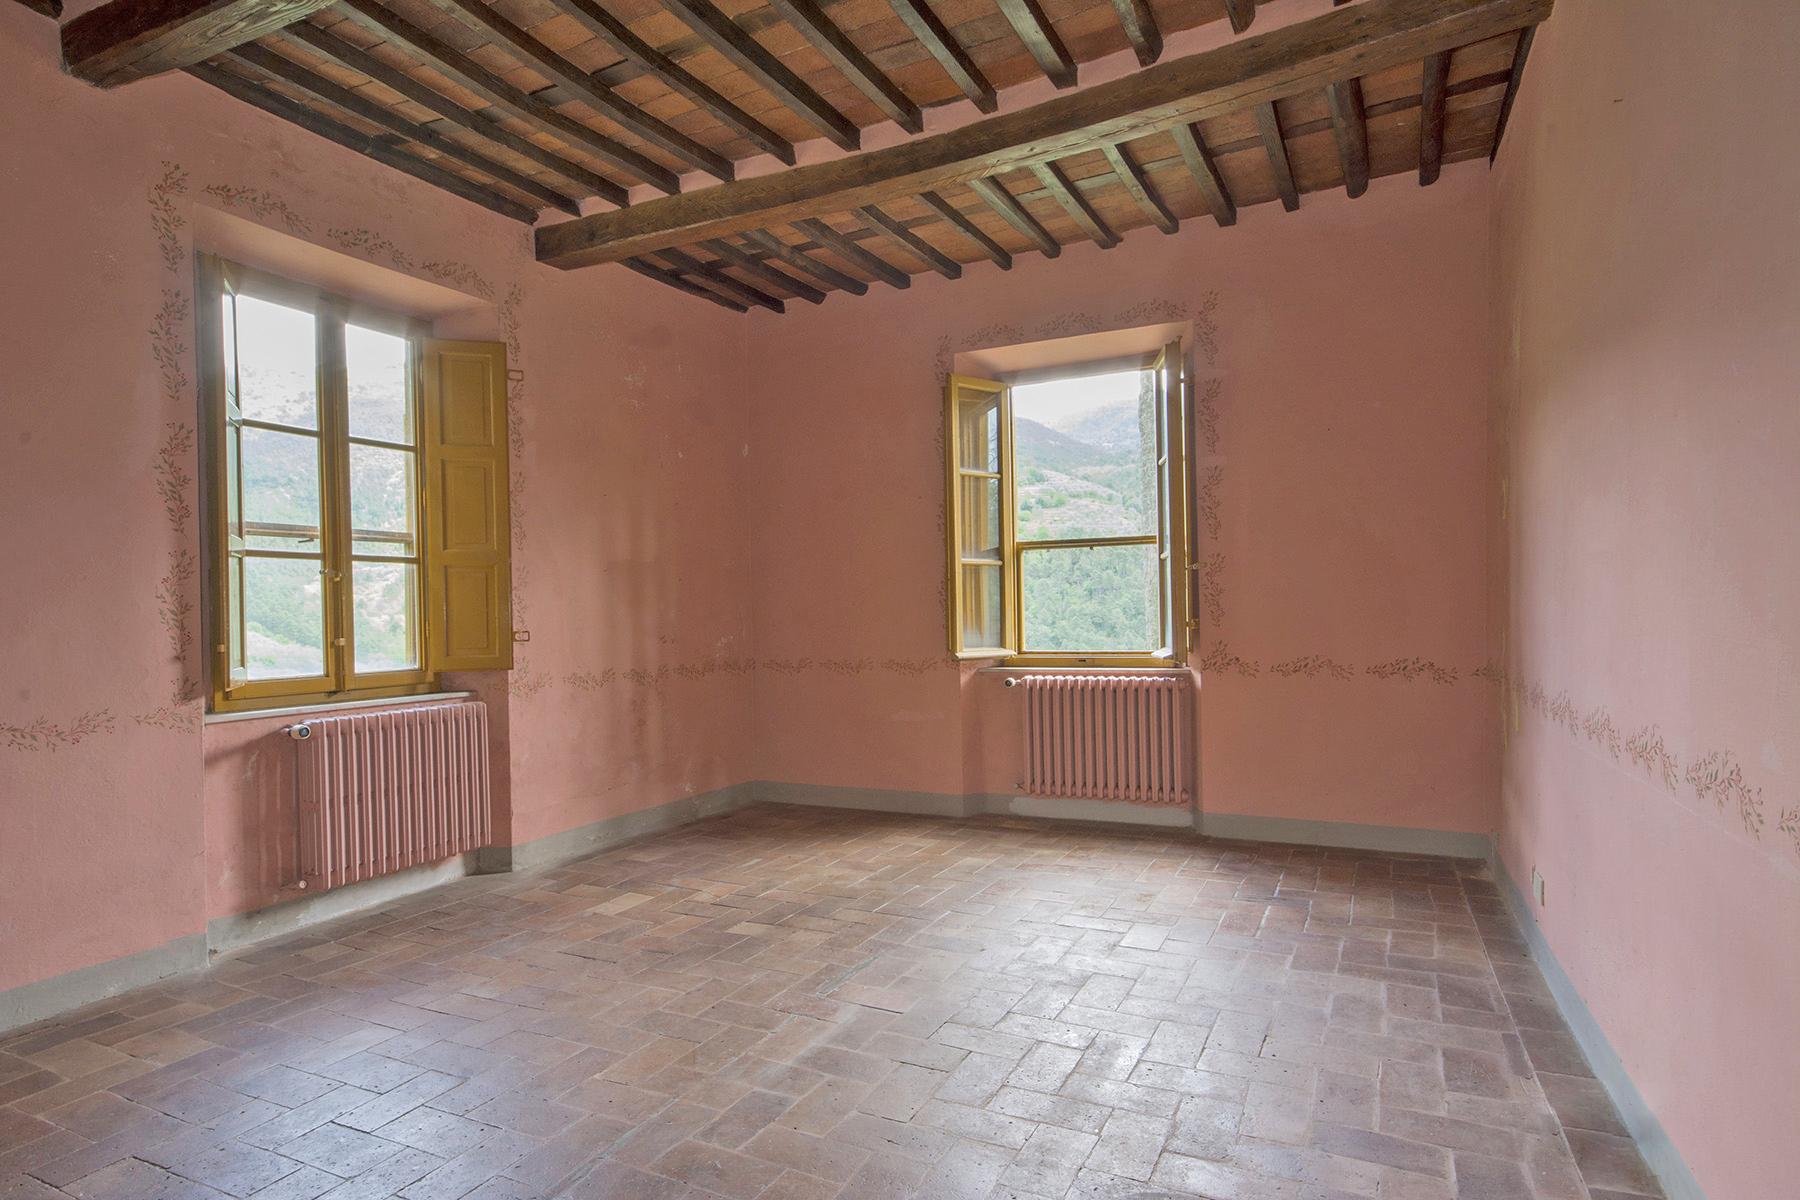 Villa in Vendita a Capannori: 5 locali, 490 mq - Foto 10